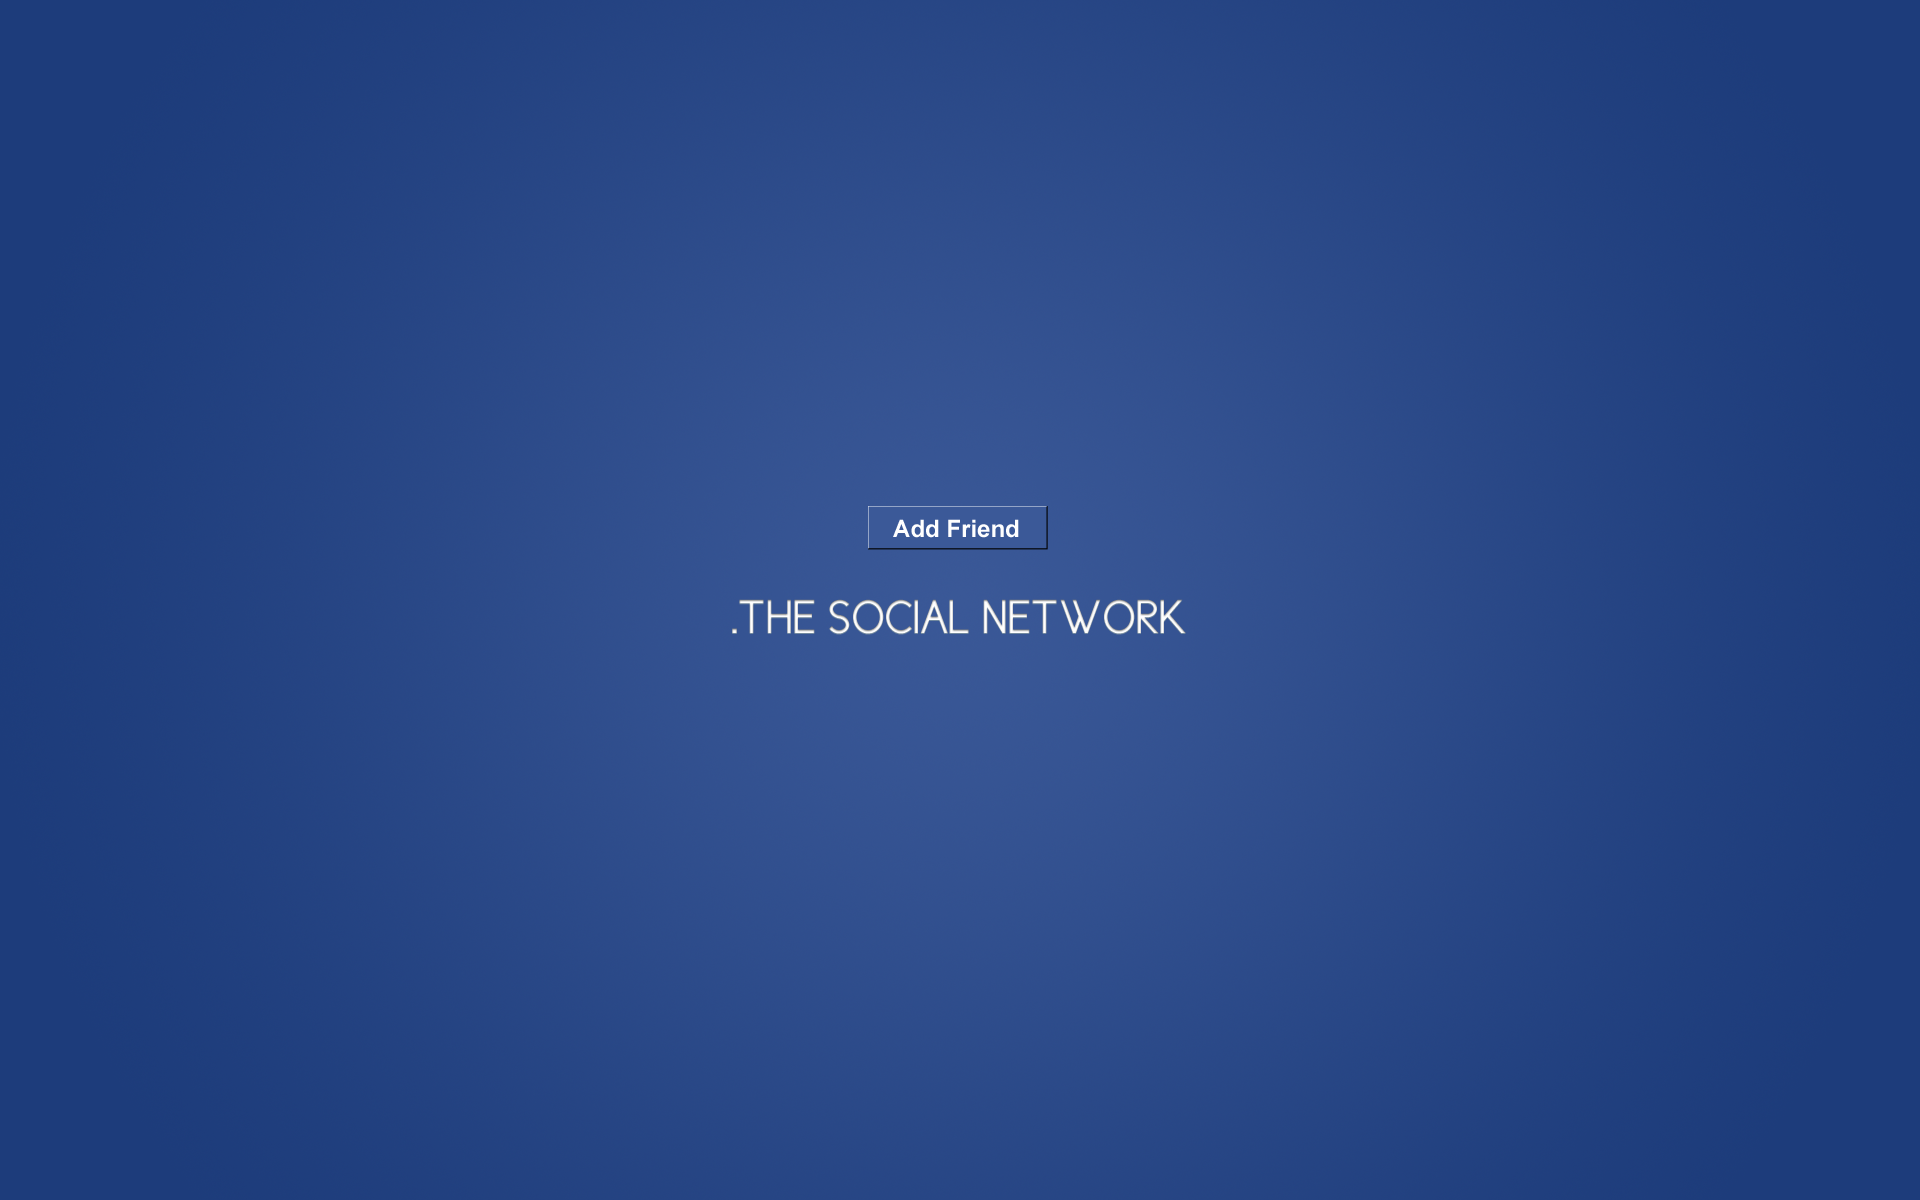 The Social Network Computer Wallpapers Desktop Backgrounds 1920x1200